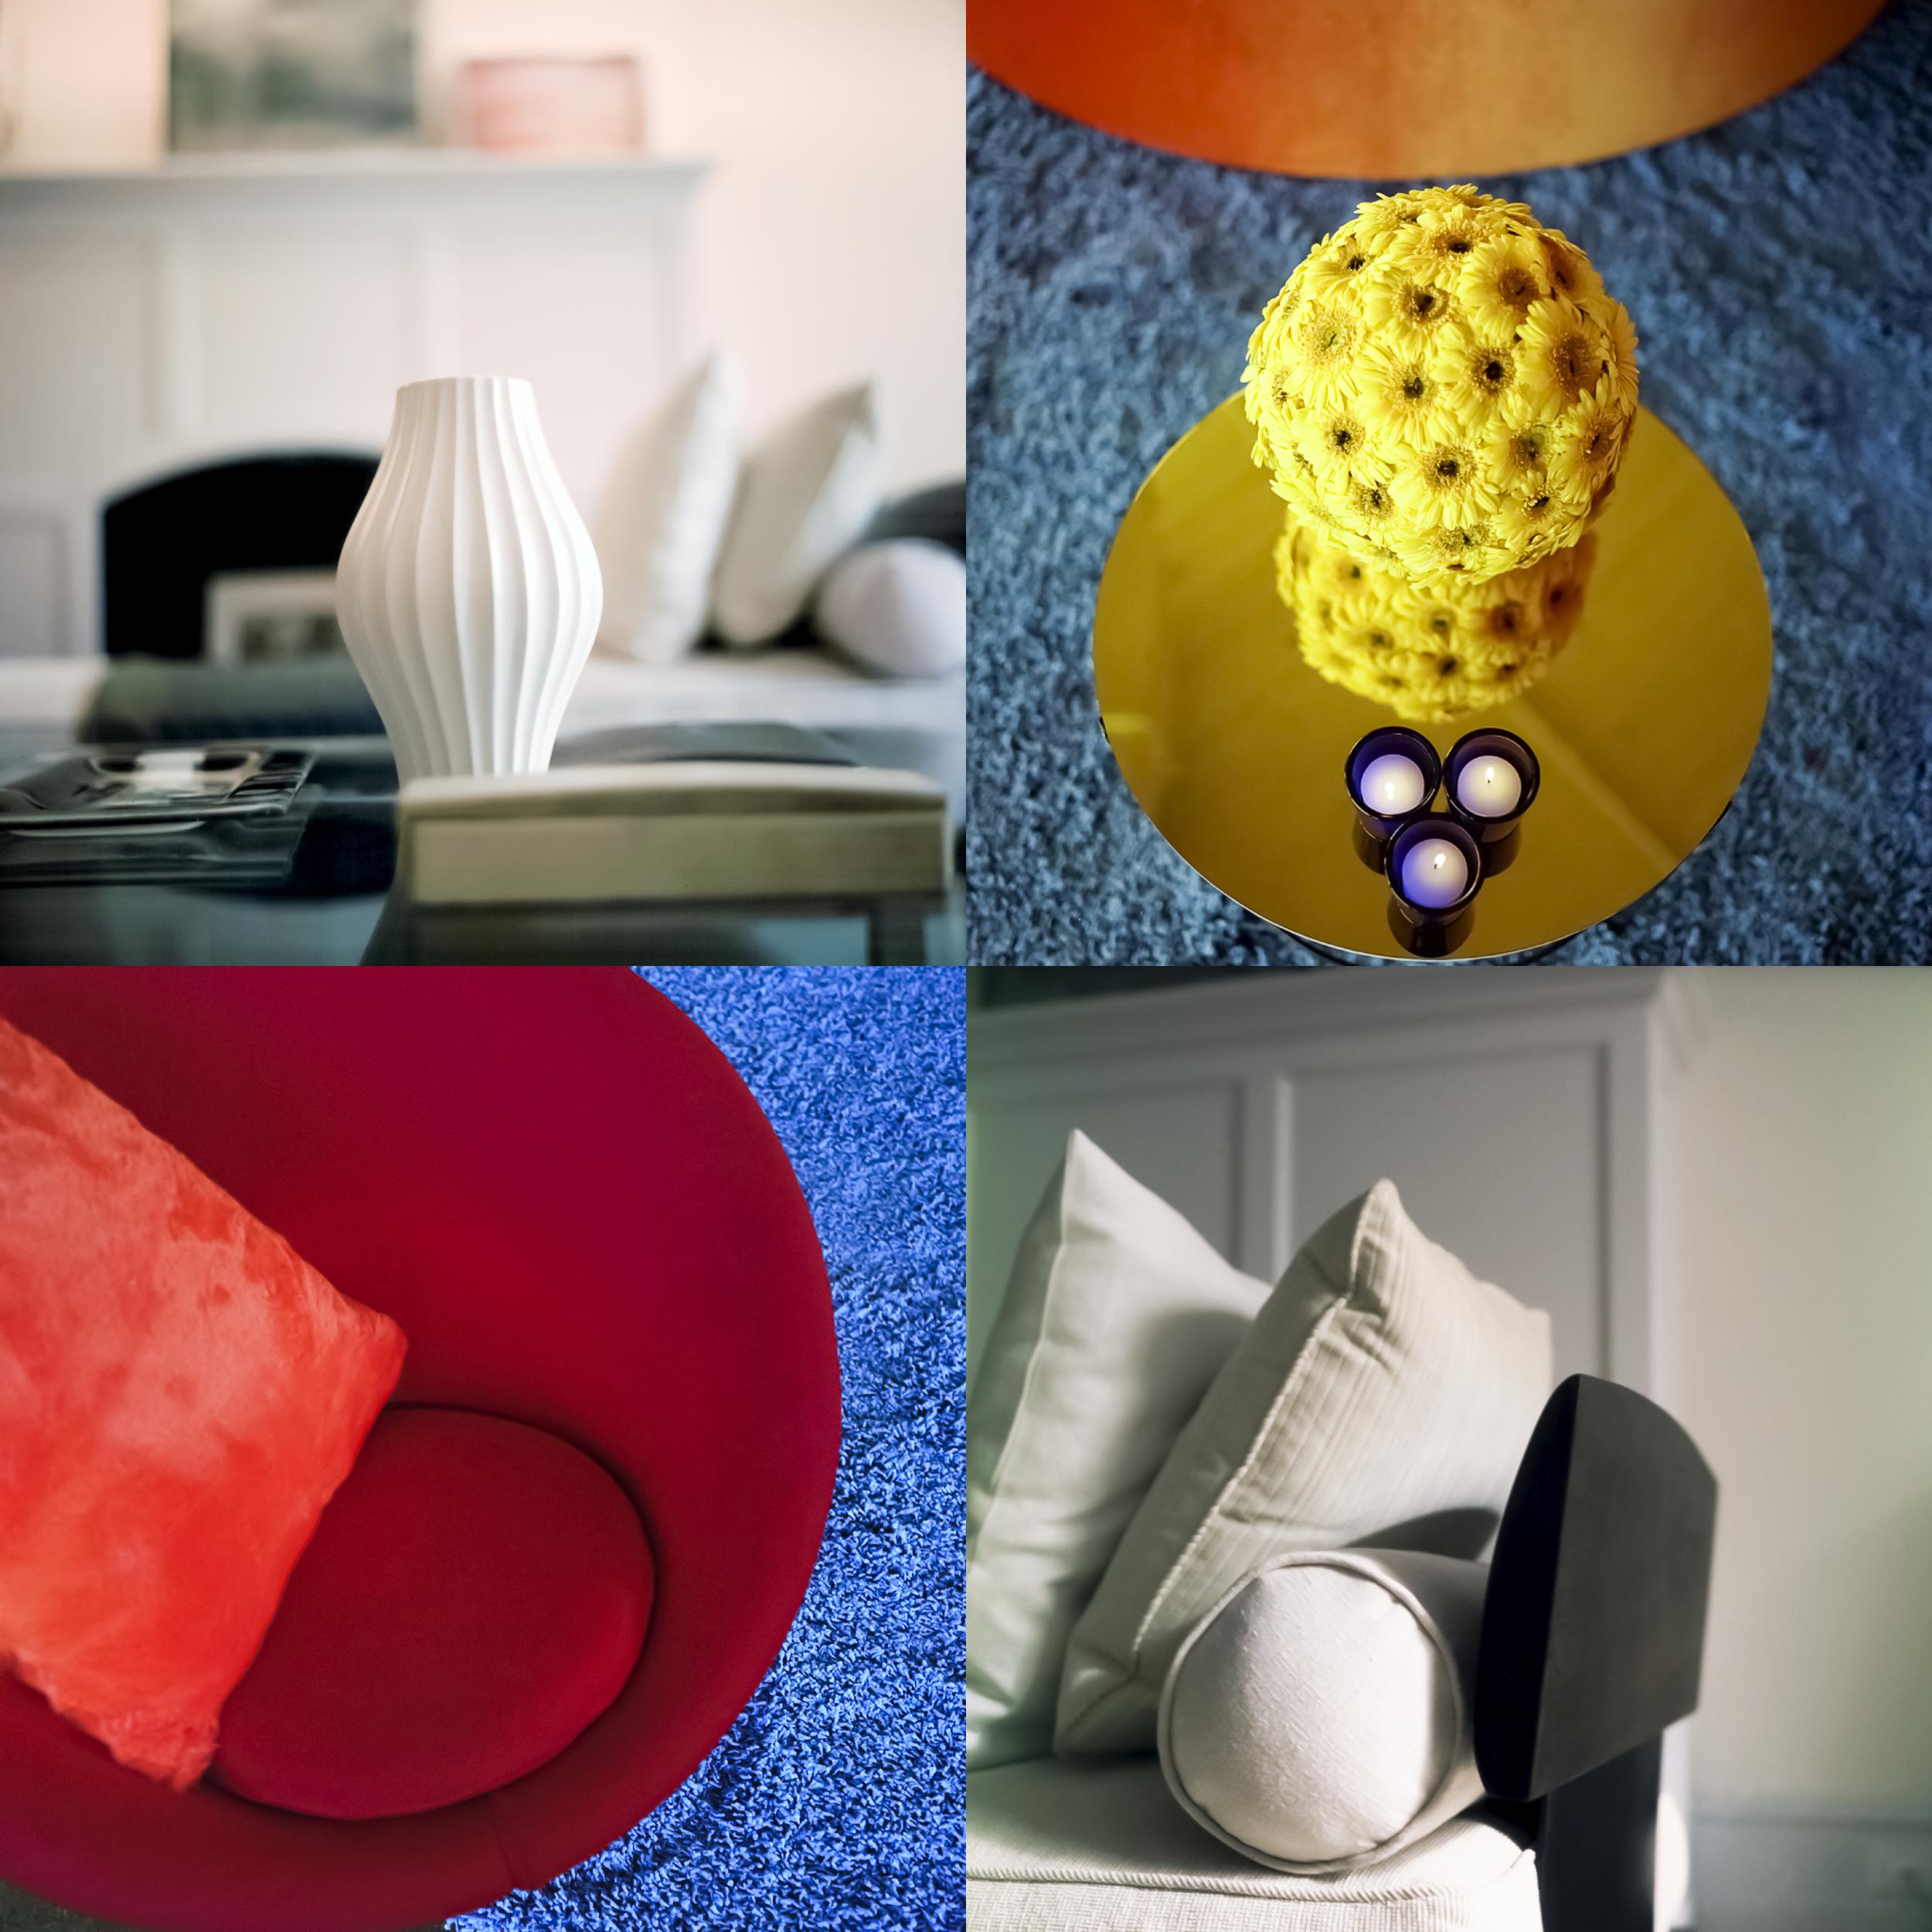 Lightroom (2001-45-06.jpg and 3 others) copy.jpg